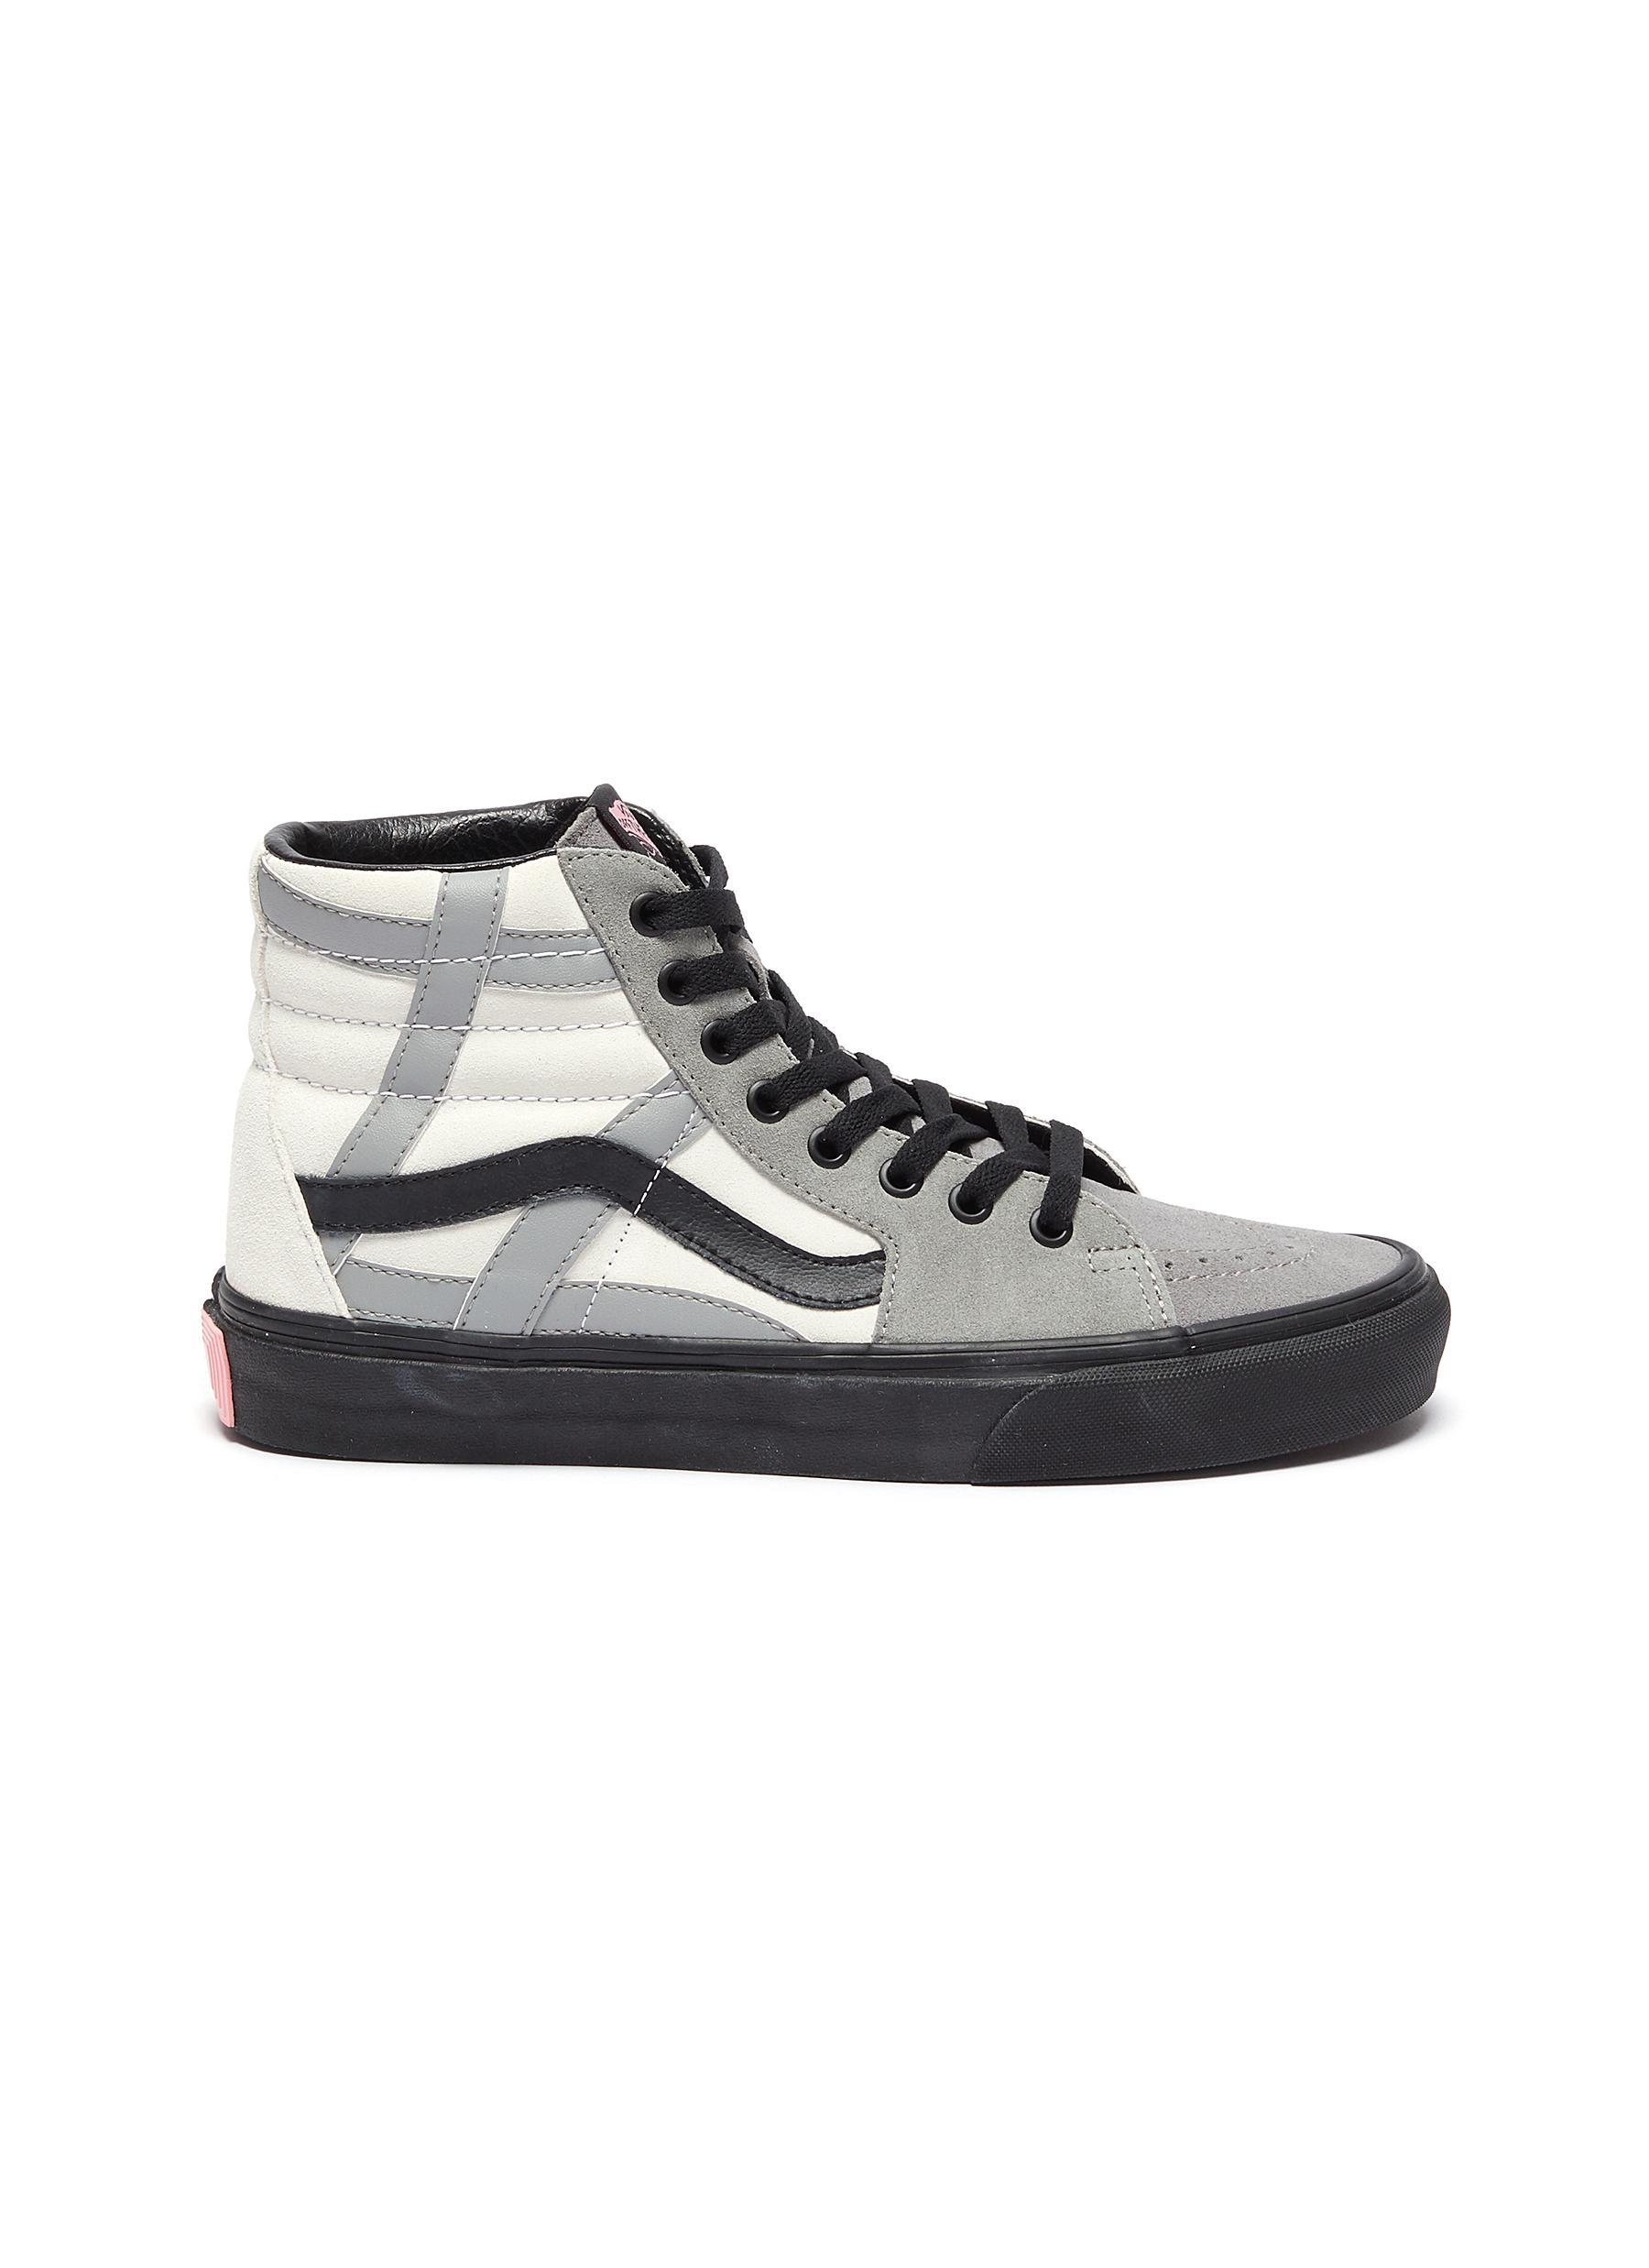 Vans Sneakers Sk8-hi Colourblock high top suede sneakers